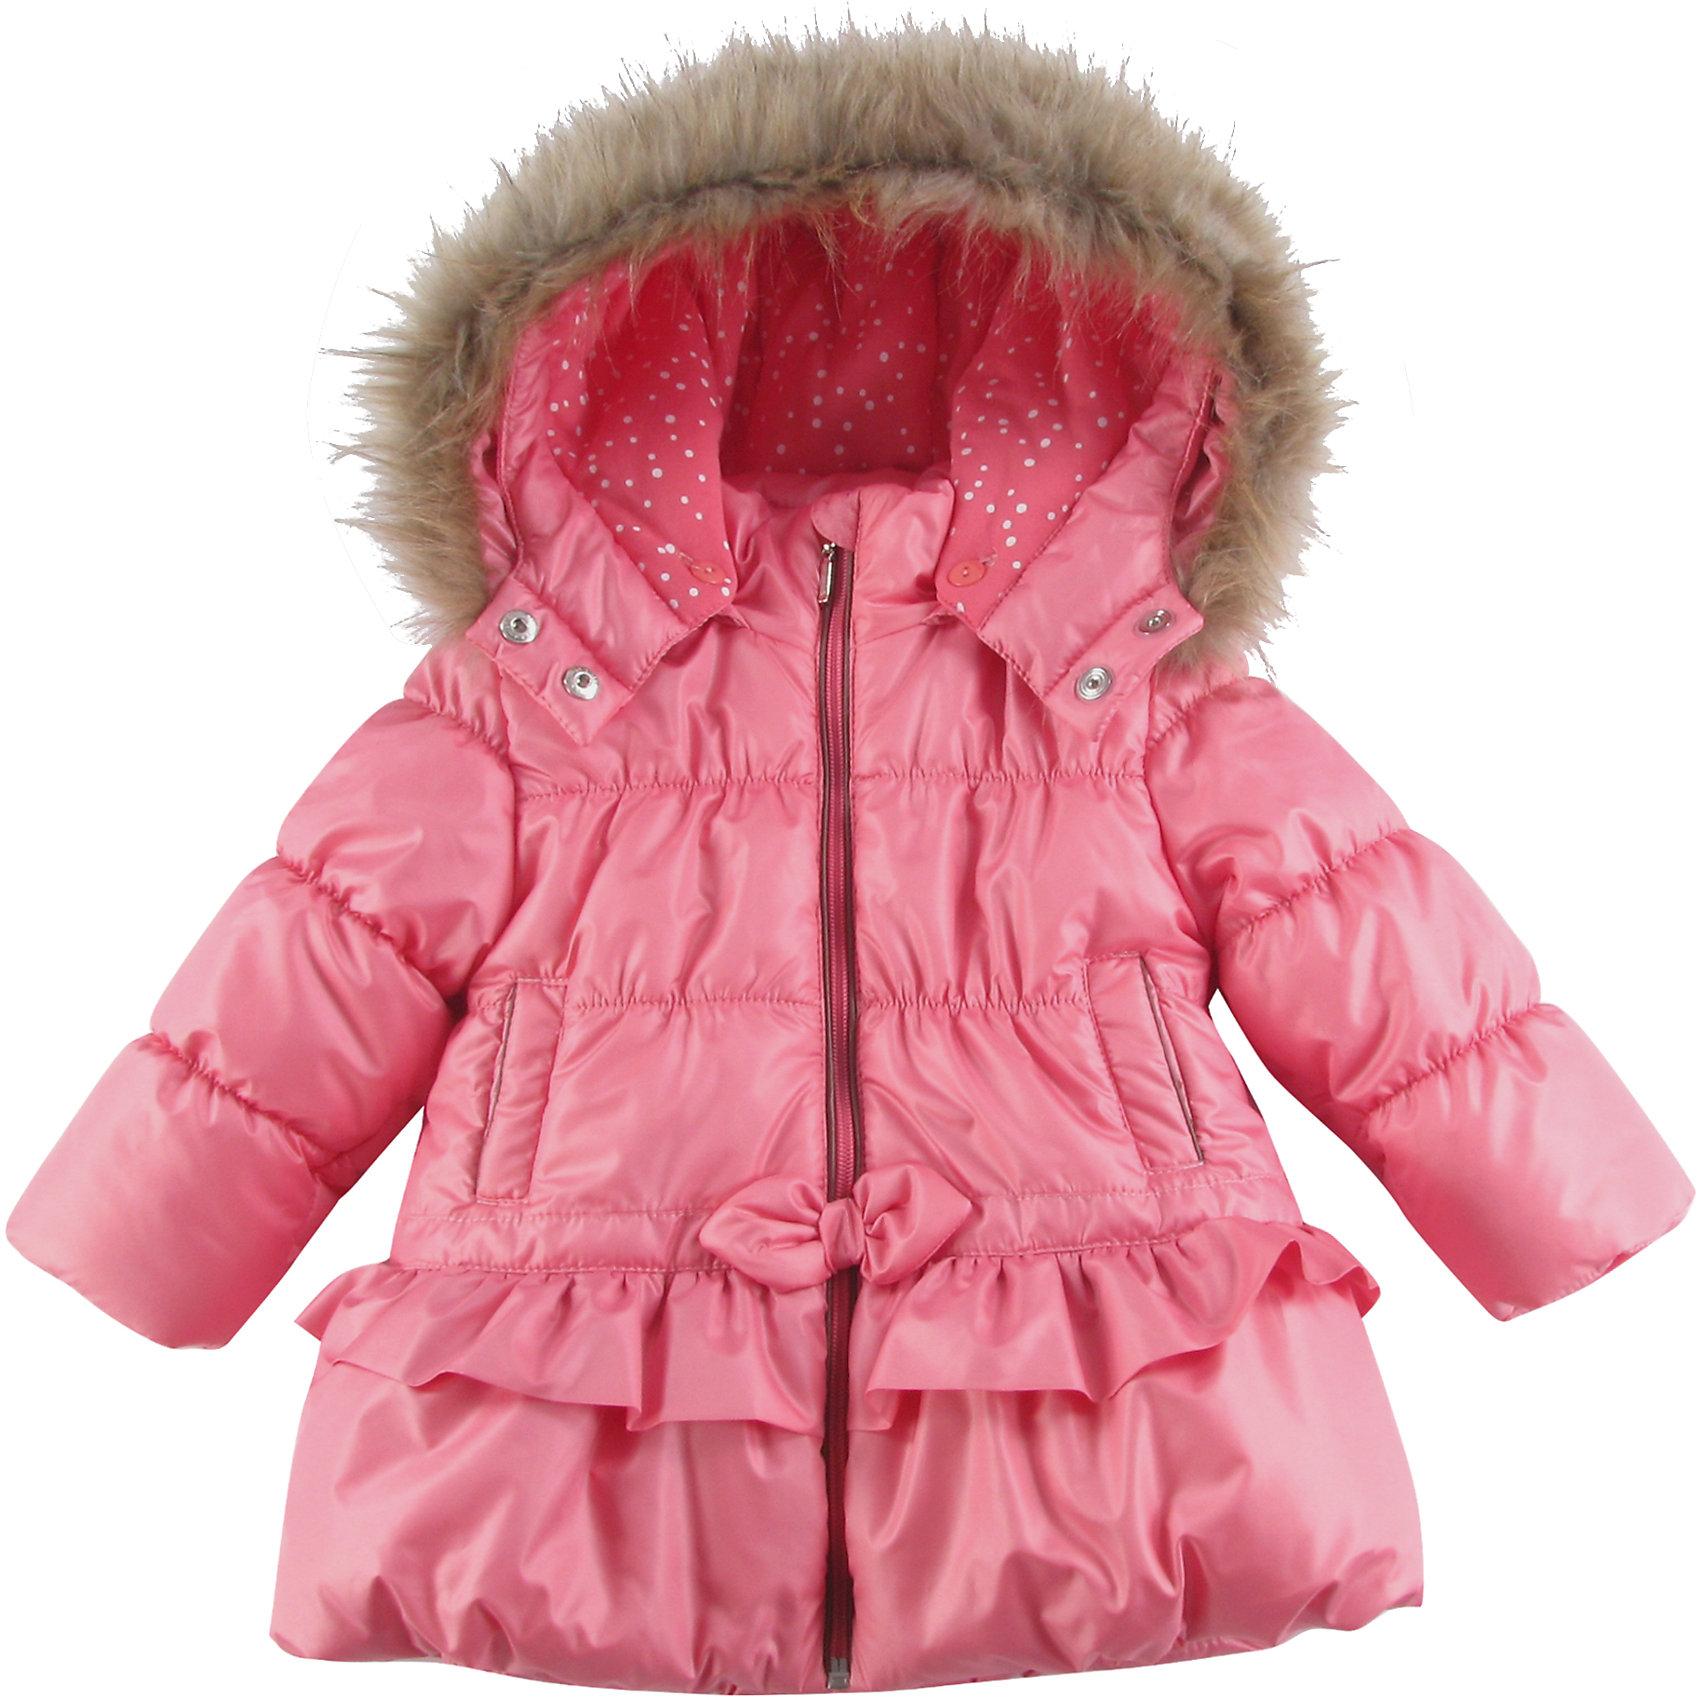 Куртка утепленная для девочки WojcikВерхняя одежда<br>Куртка утепленная для девочки Wojcik<br>Состав:<br>Полиэстер 100%<br><br>Ширина мм: 356<br>Глубина мм: 10<br>Высота мм: 245<br>Вес г: 519<br>Цвет: розовый<br>Возраст от месяцев: 18<br>Возраст до месяцев: 24<br>Пол: Женский<br>Возраст: Детский<br>Размер: 92,98,74,80,86<br>SKU: 5590786